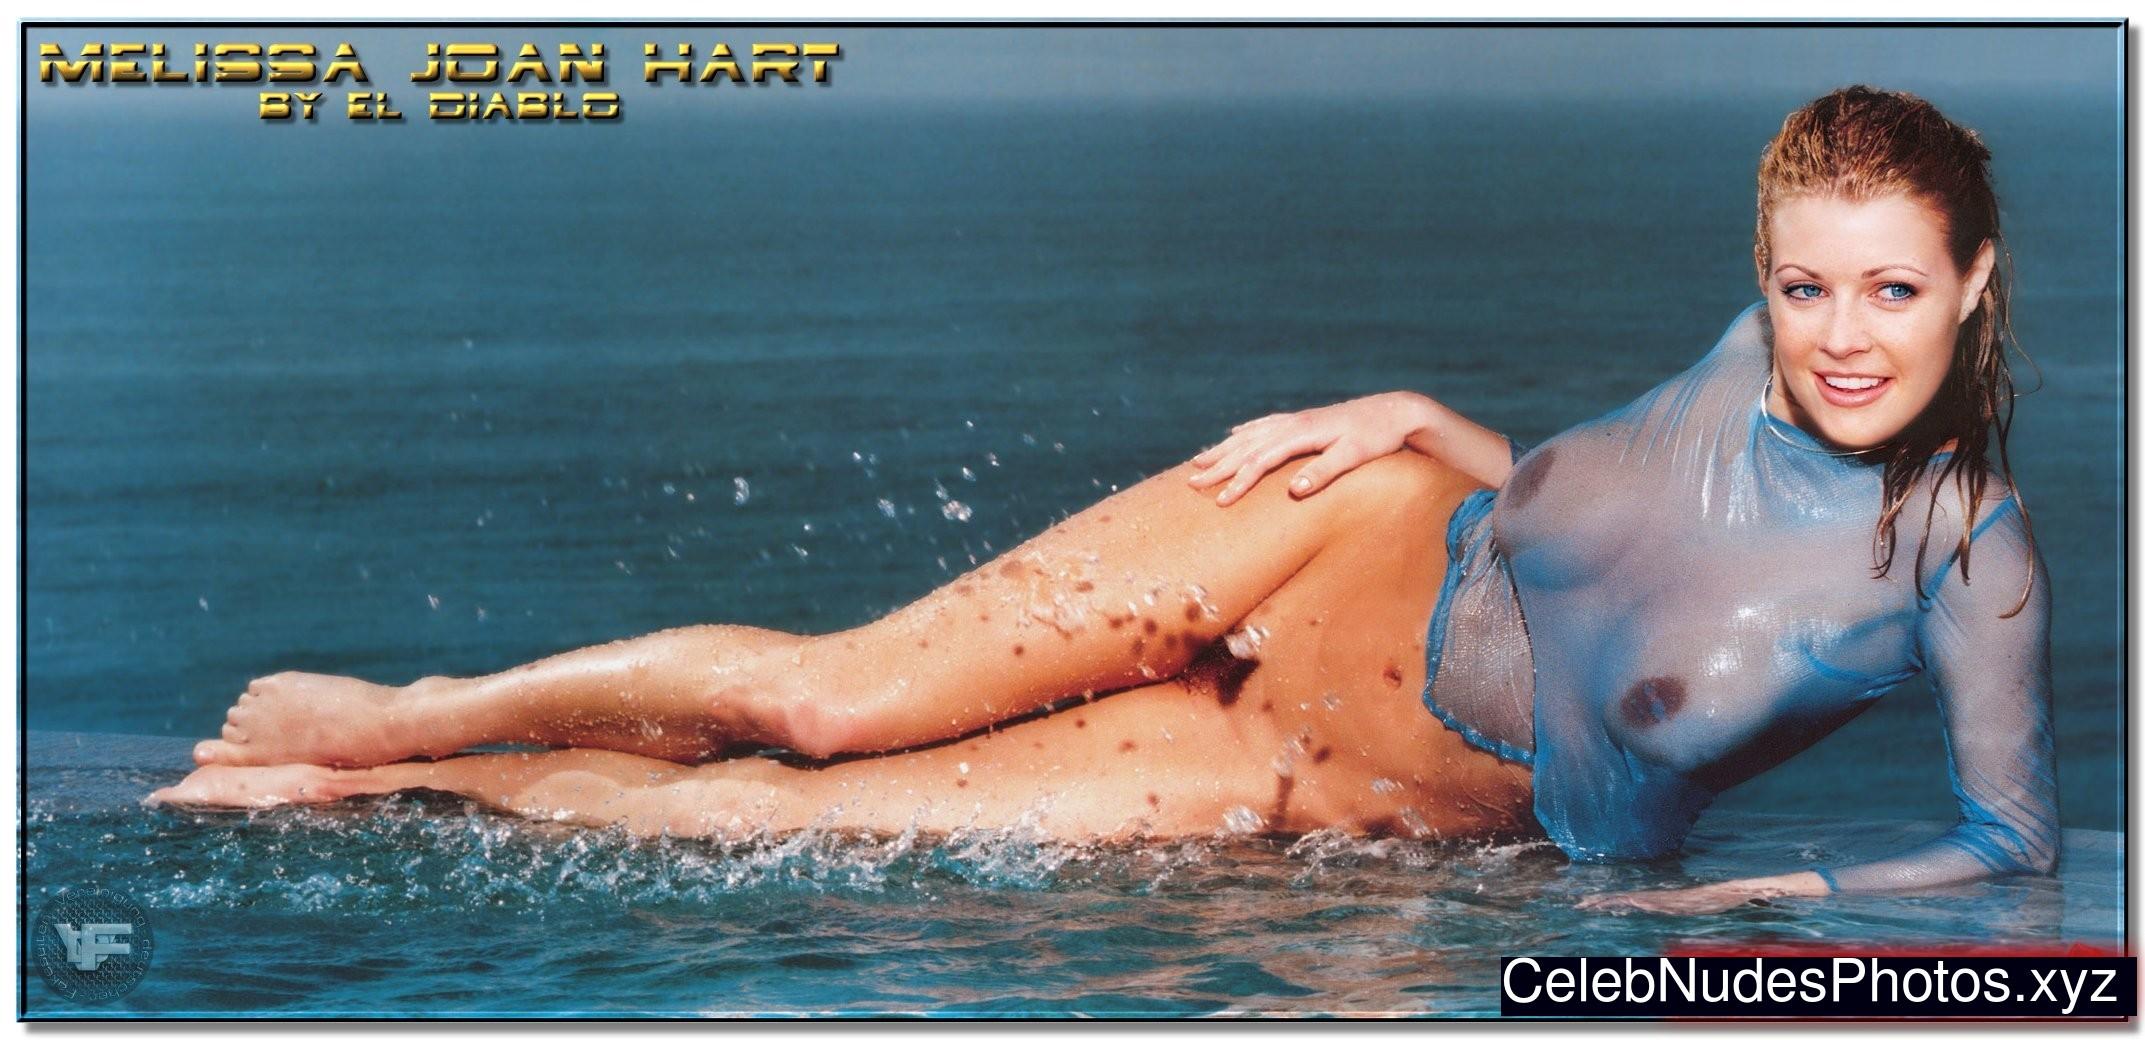 melissa joan hart nude gallery